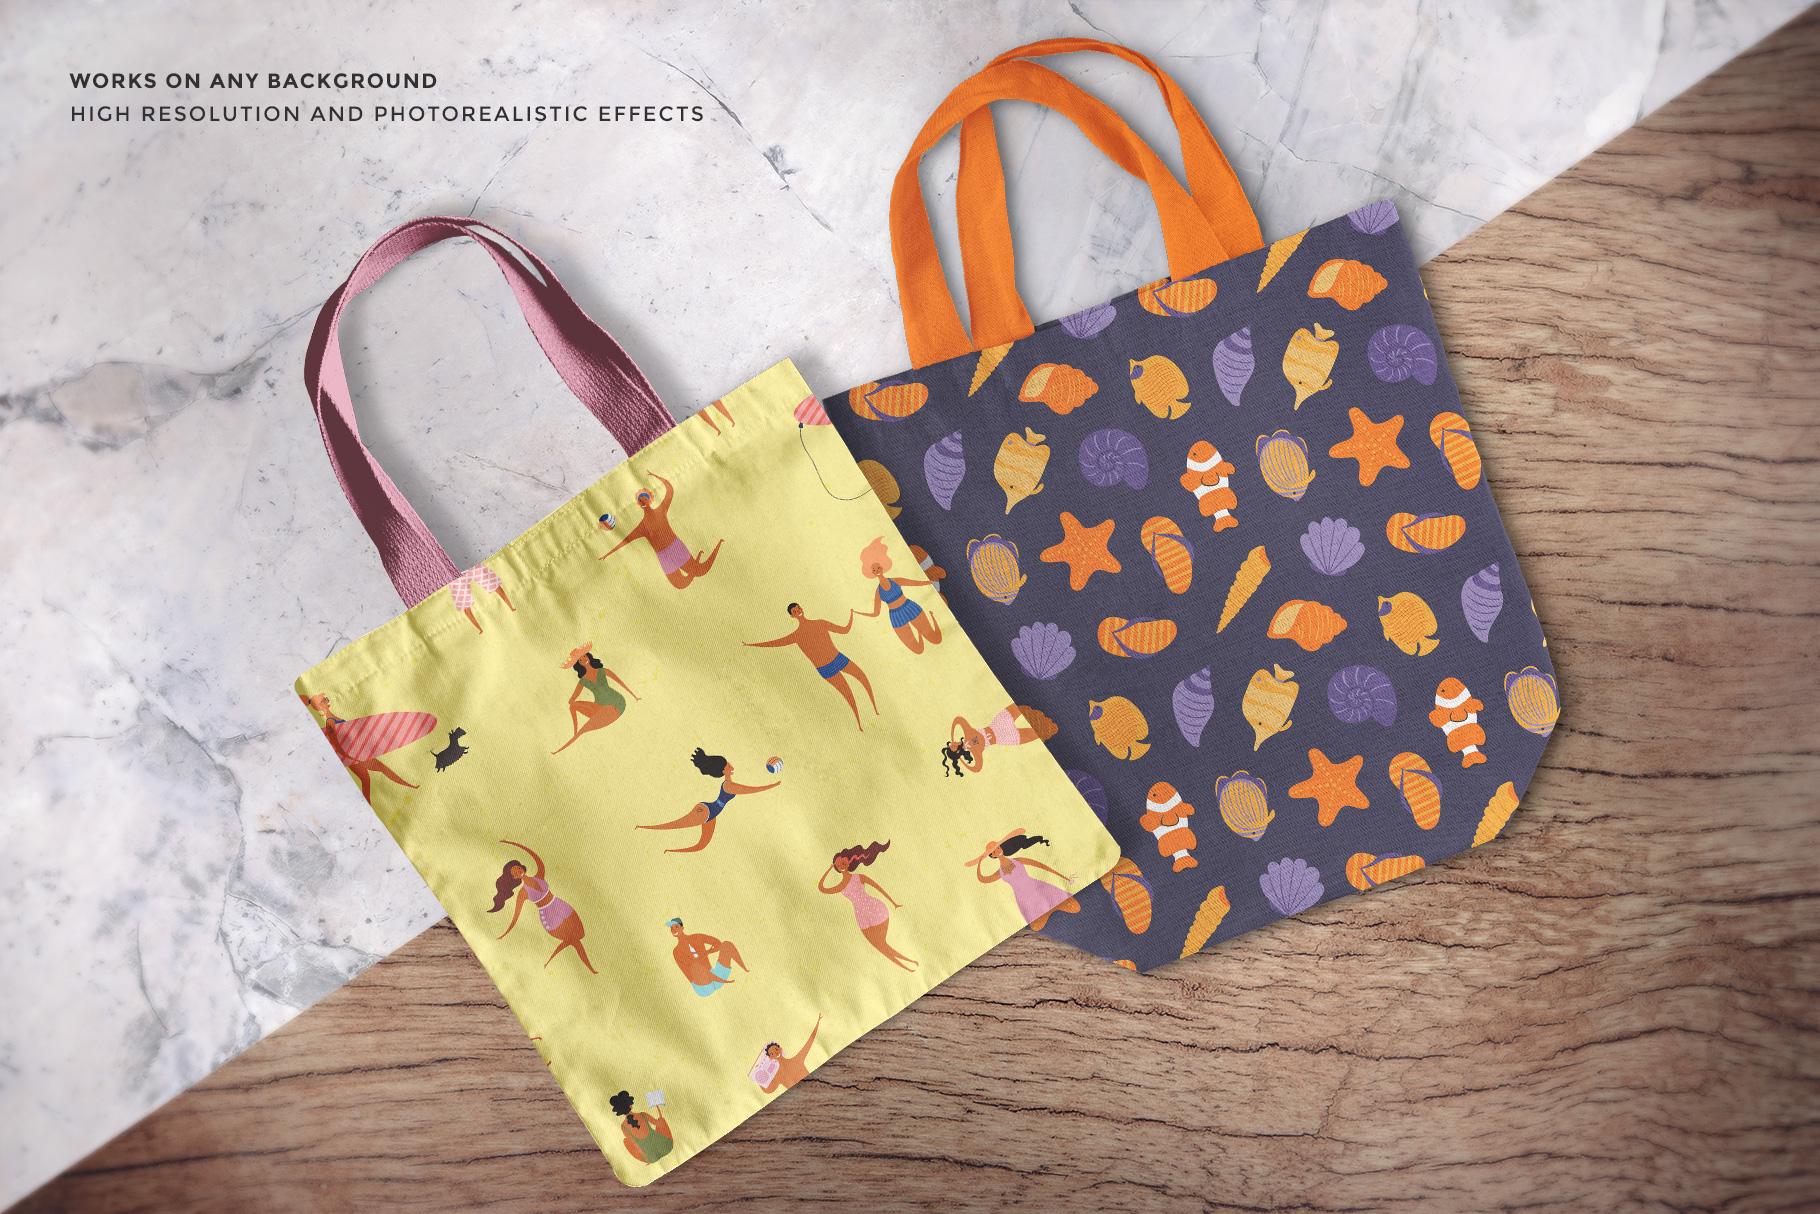 tote bag mockup set image preview of the tote bags